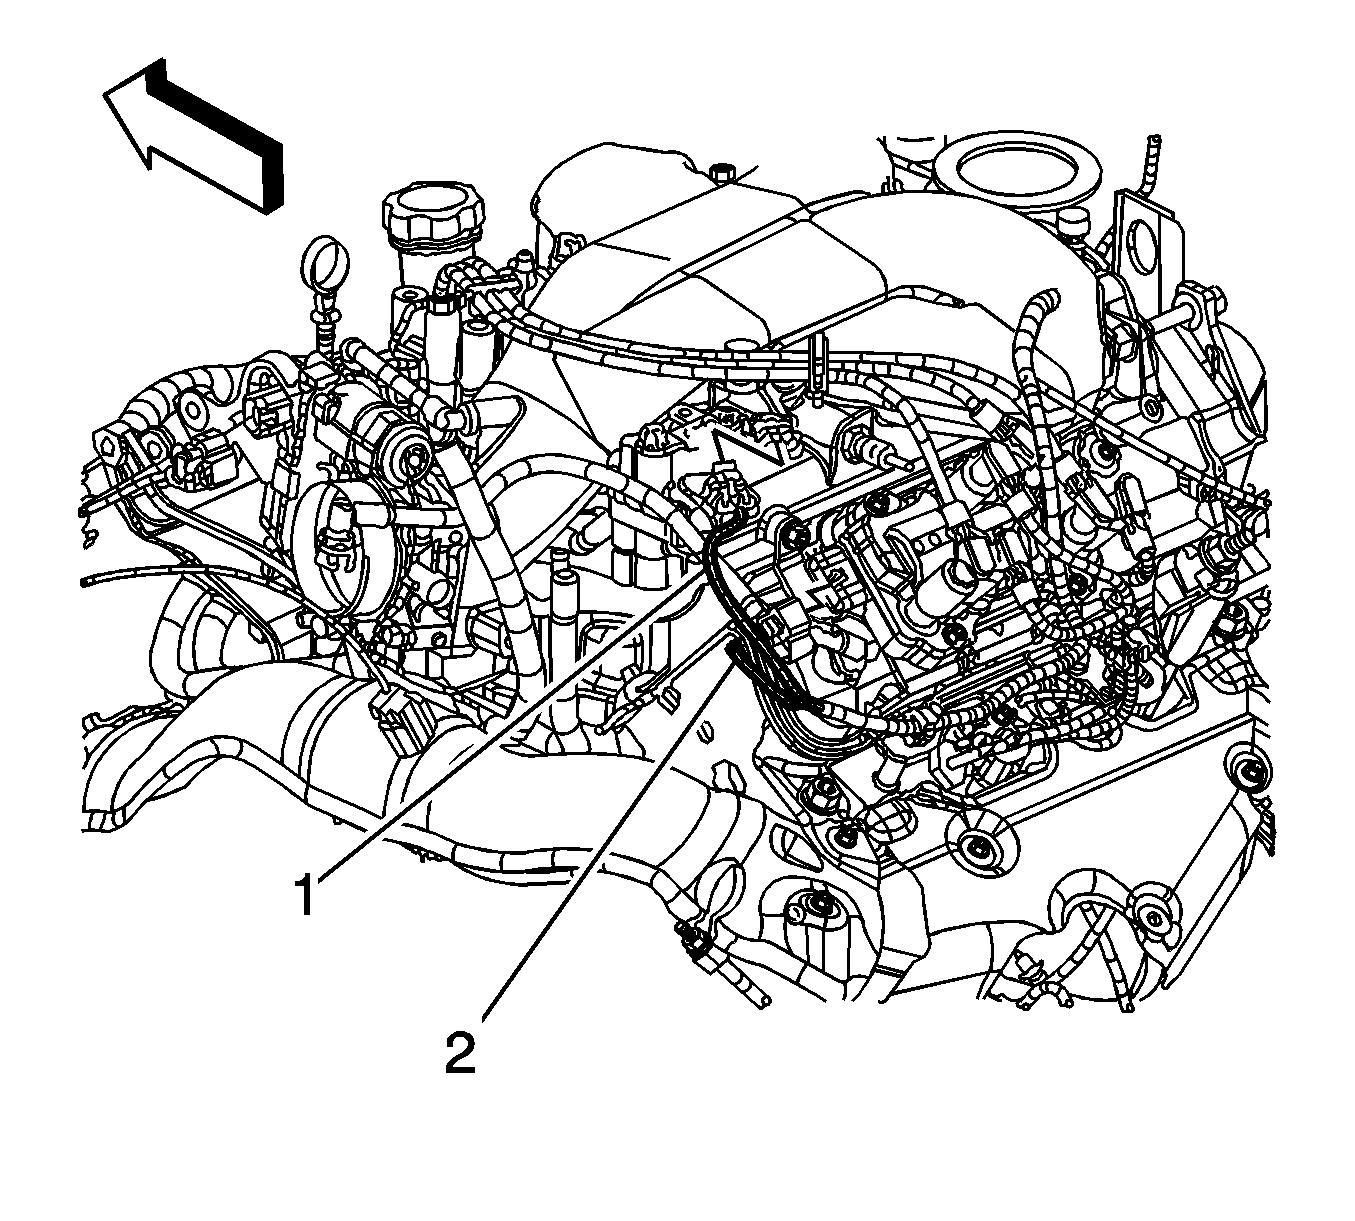 Dc 9084 2006 Buick Terraza Engine Diagram Download Diagram